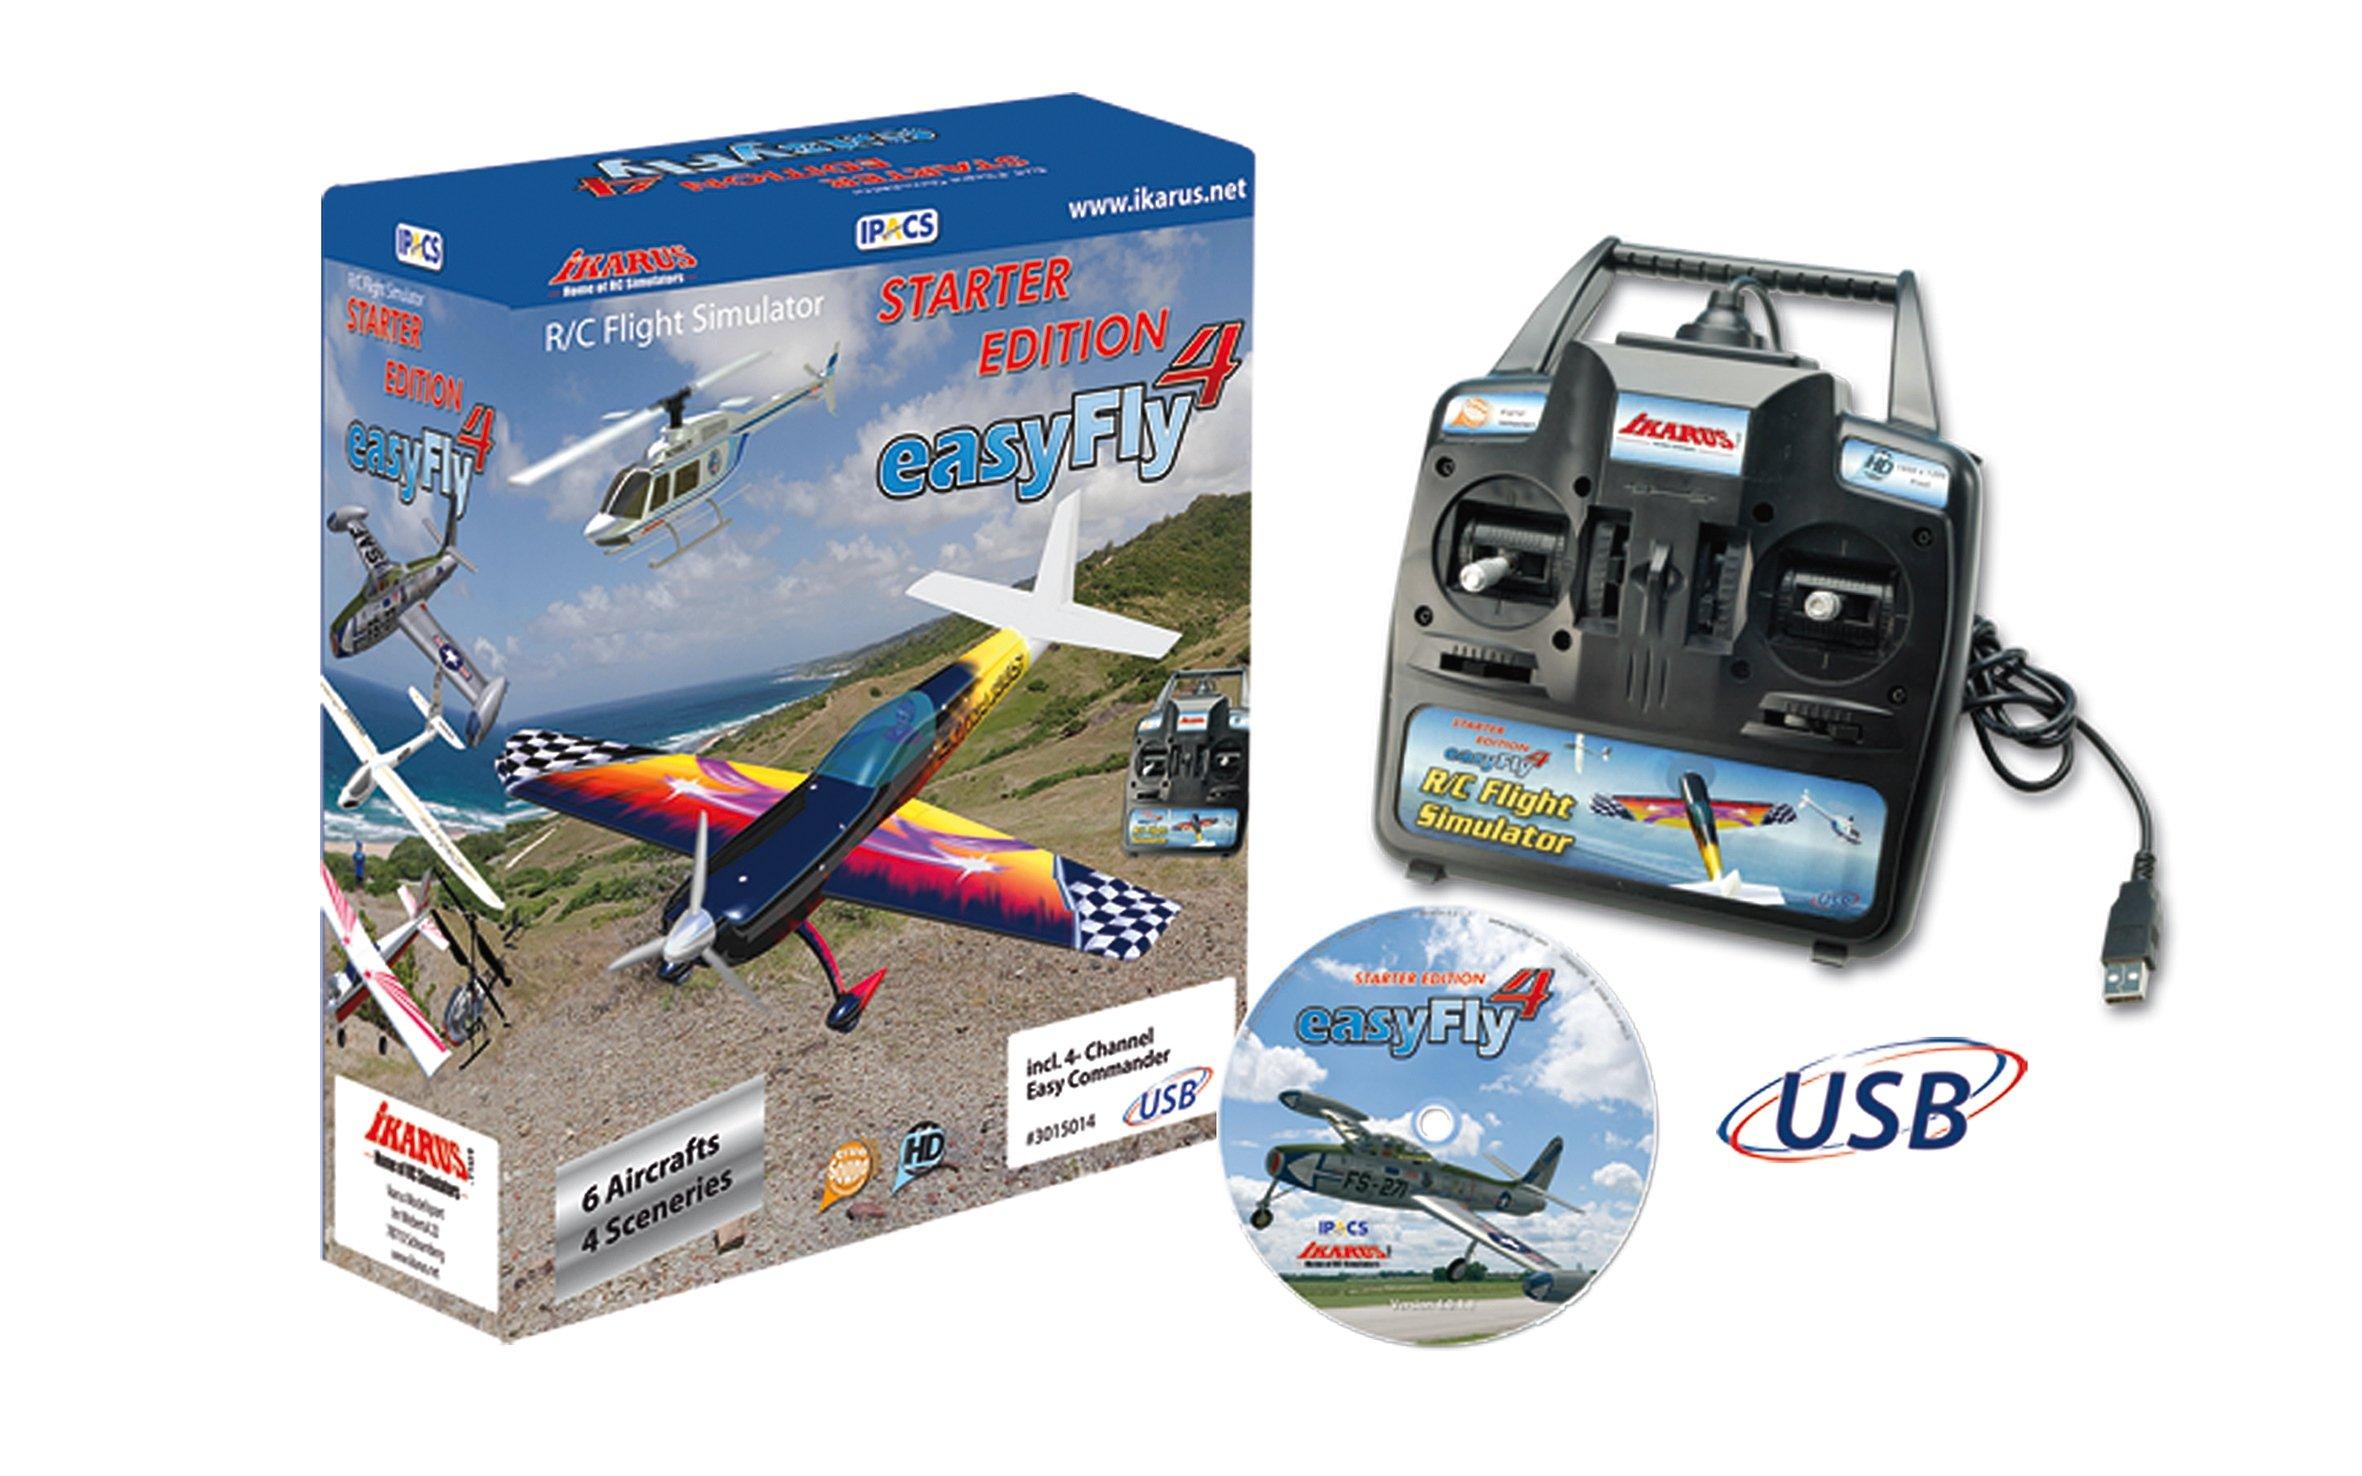 easyfly 4